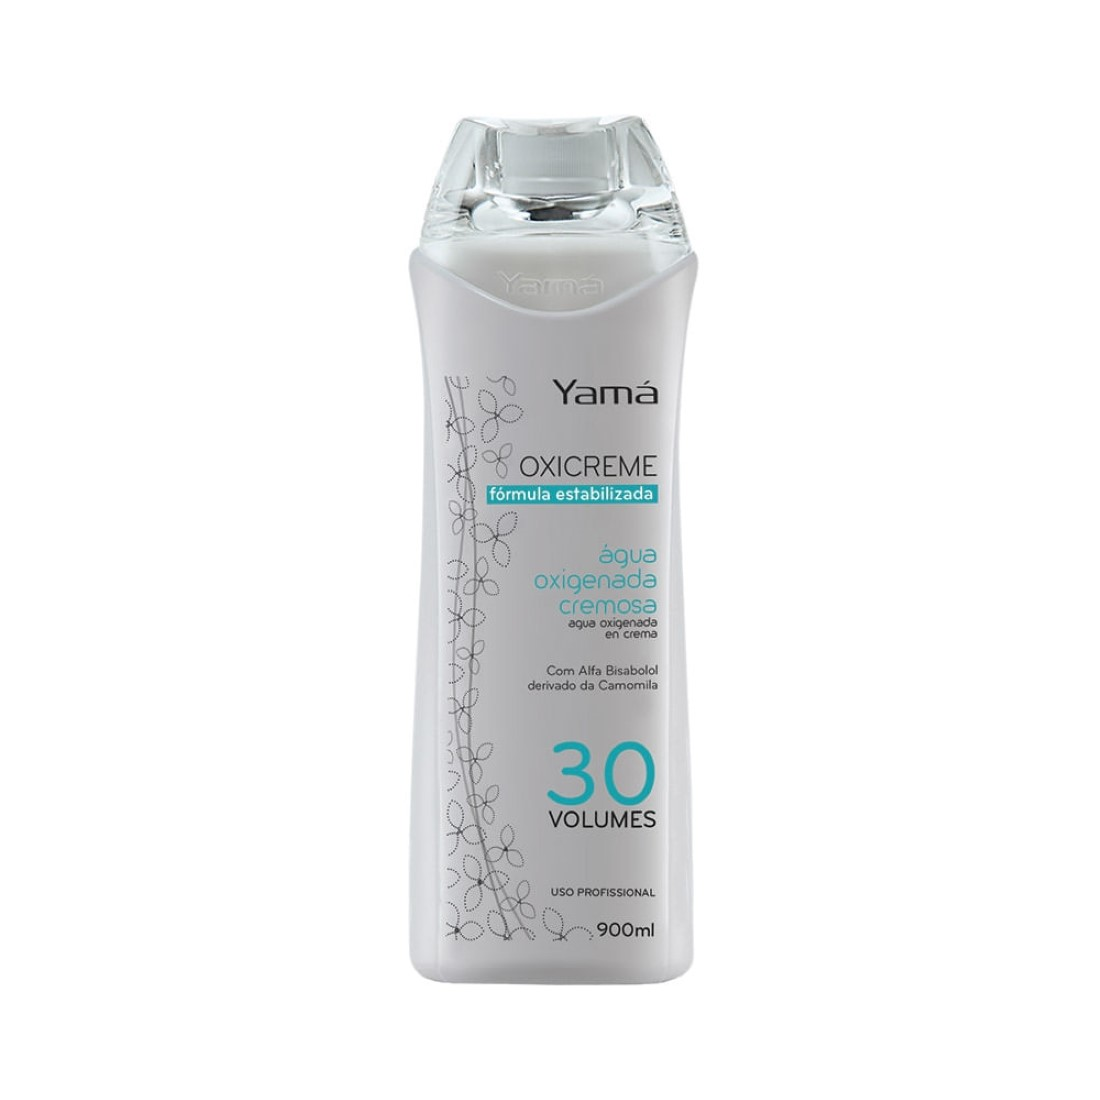 Oxicreme Água Oxigenada Cremosa 30 Volumes 900ml - Yamá